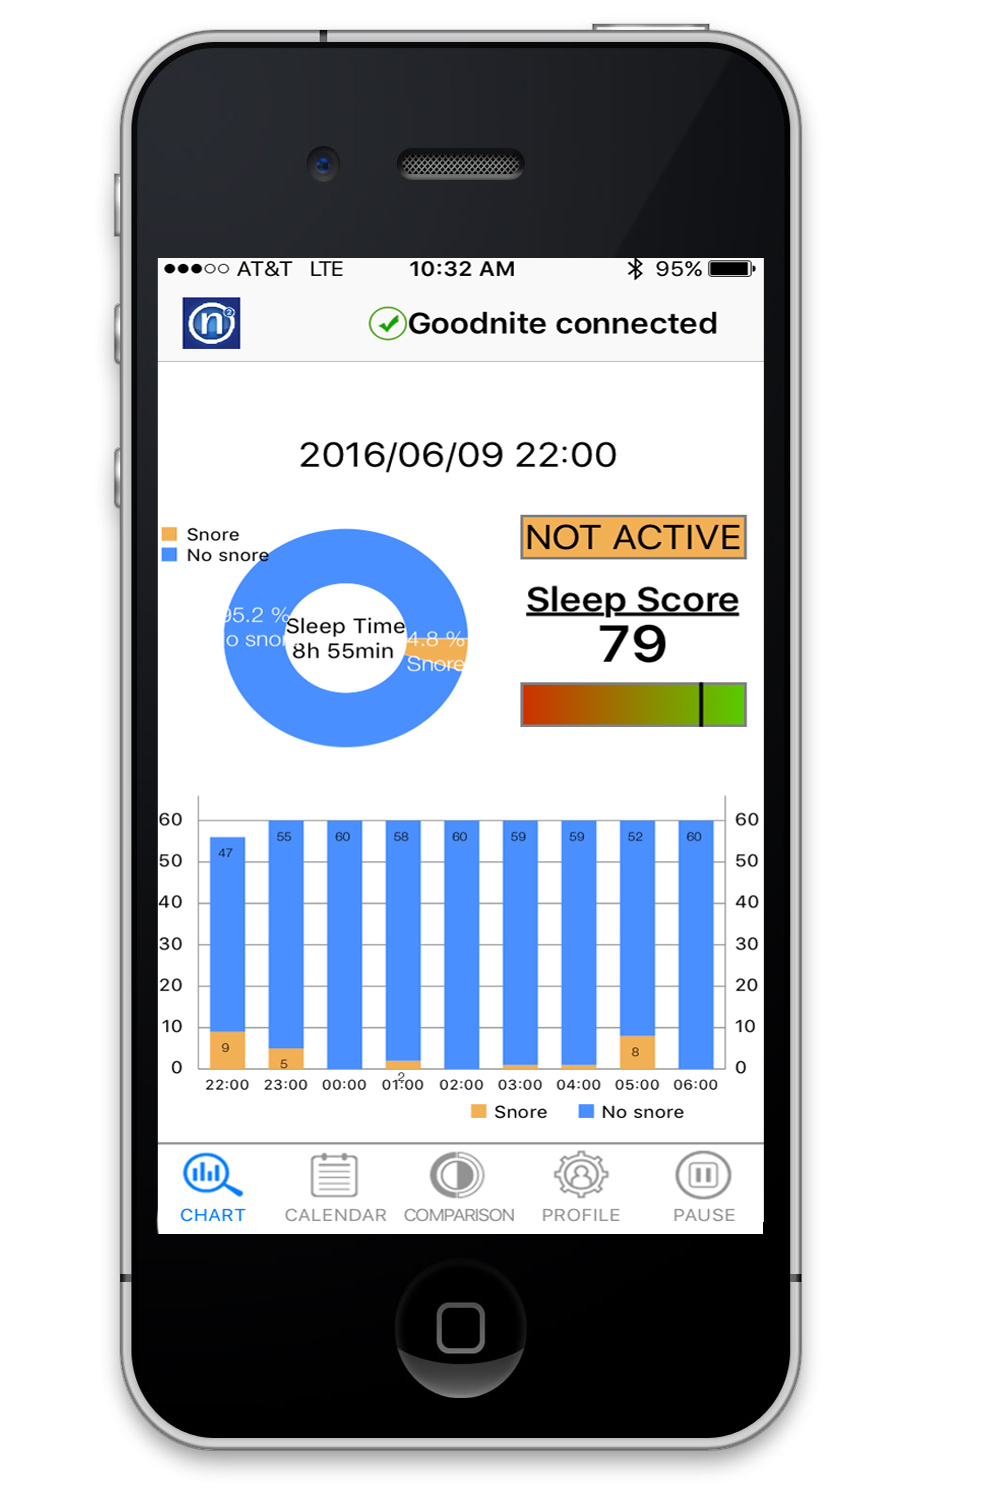 goodnite-sleep-pillow-nitetronic-app-on-phone.jpg